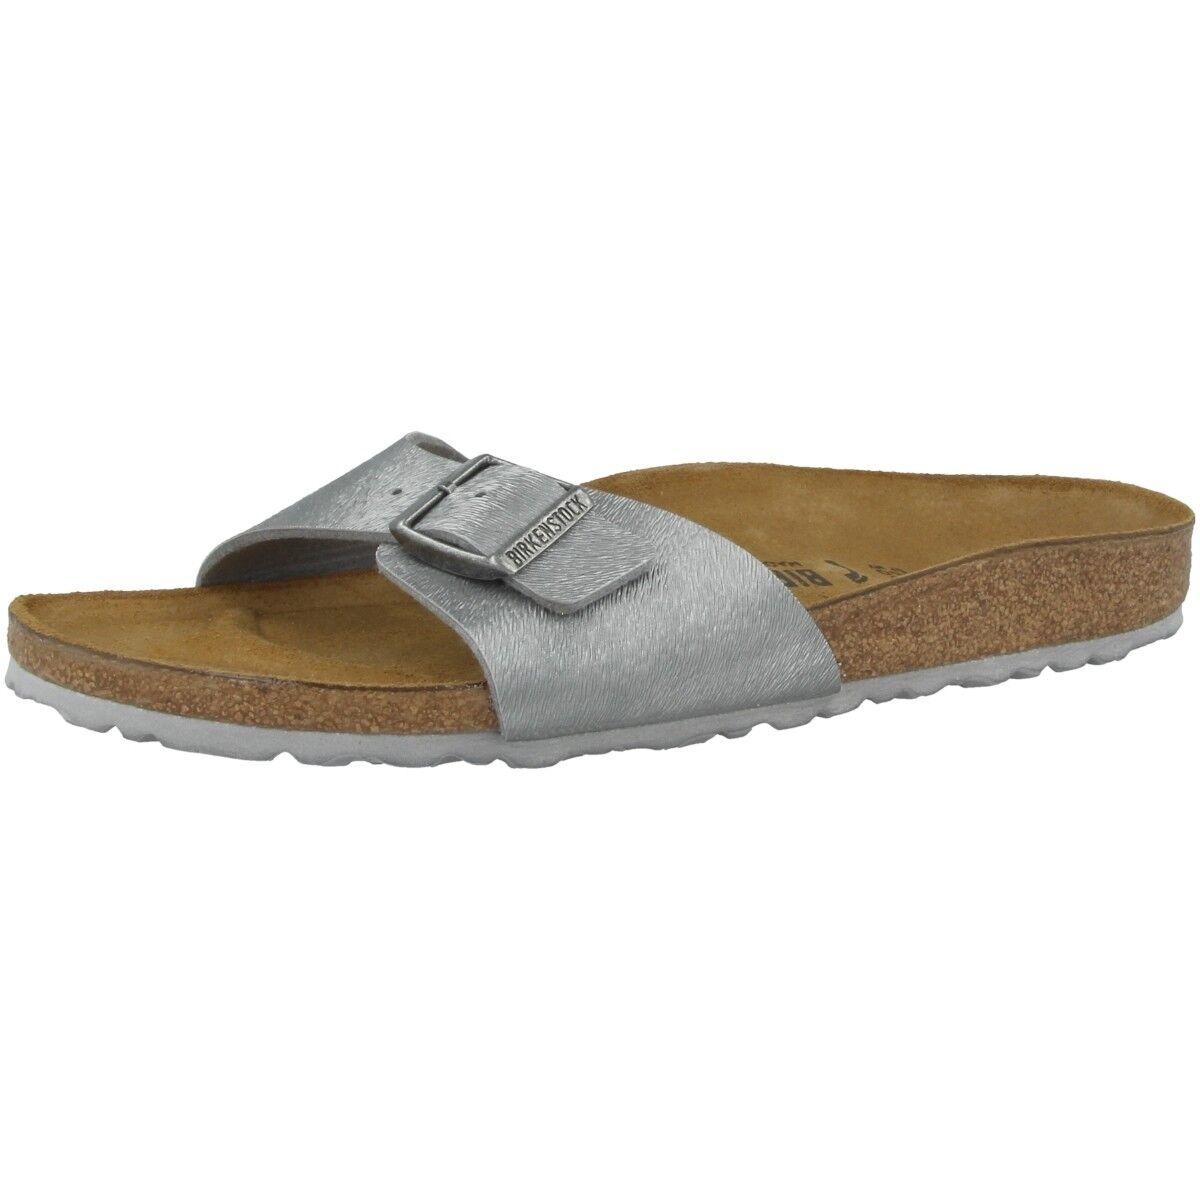 Birkenstock Madrid Birko-Flor Schuhe Pantolette animal gray Weite schmal 1008638